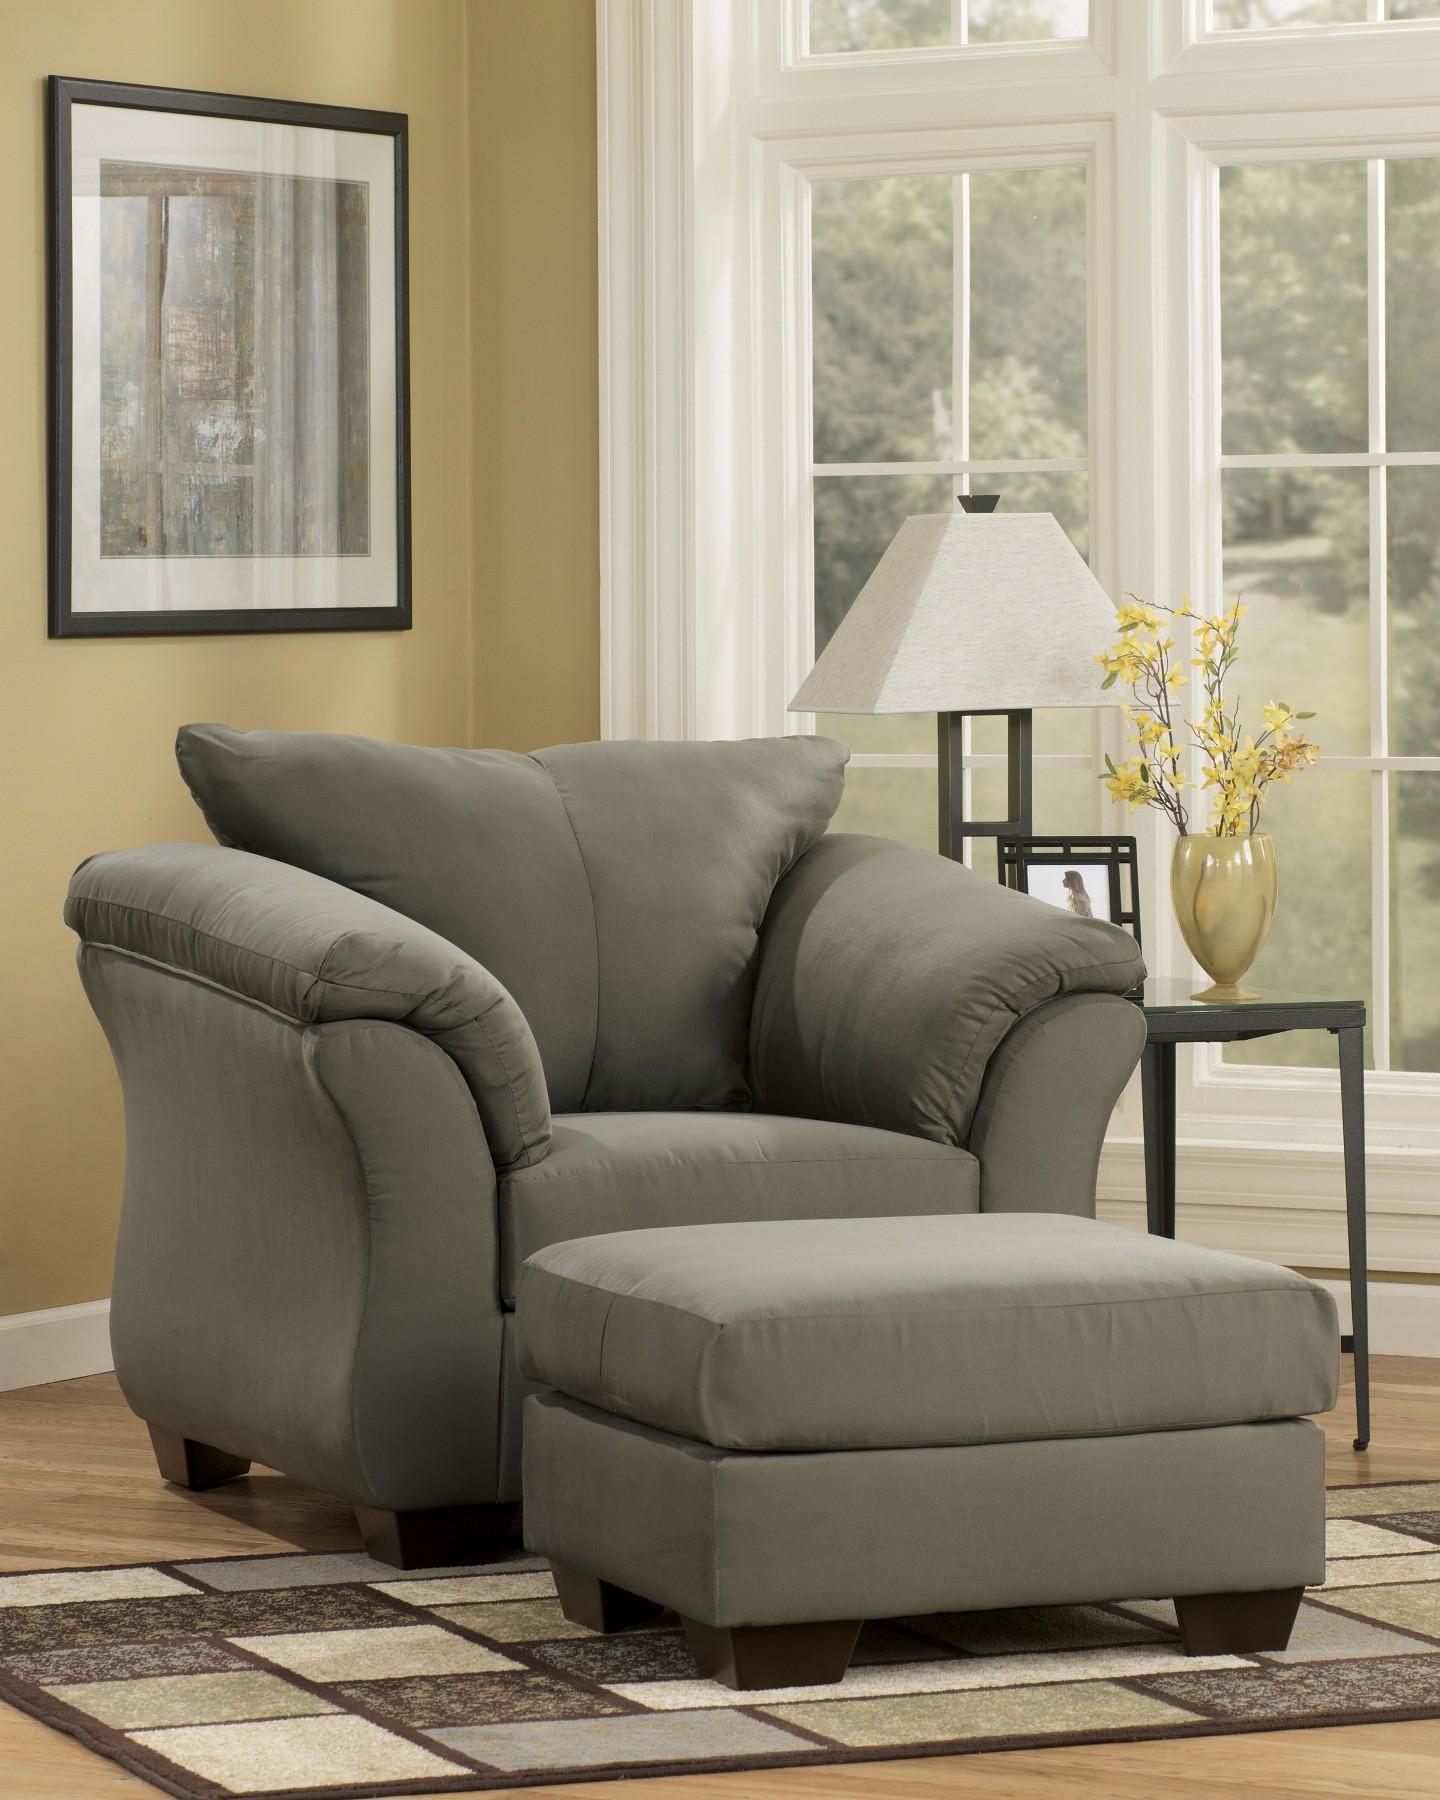 Ashley Furniture Living Room Set: Darcy Sage Living Room Set From Ashley (75003)